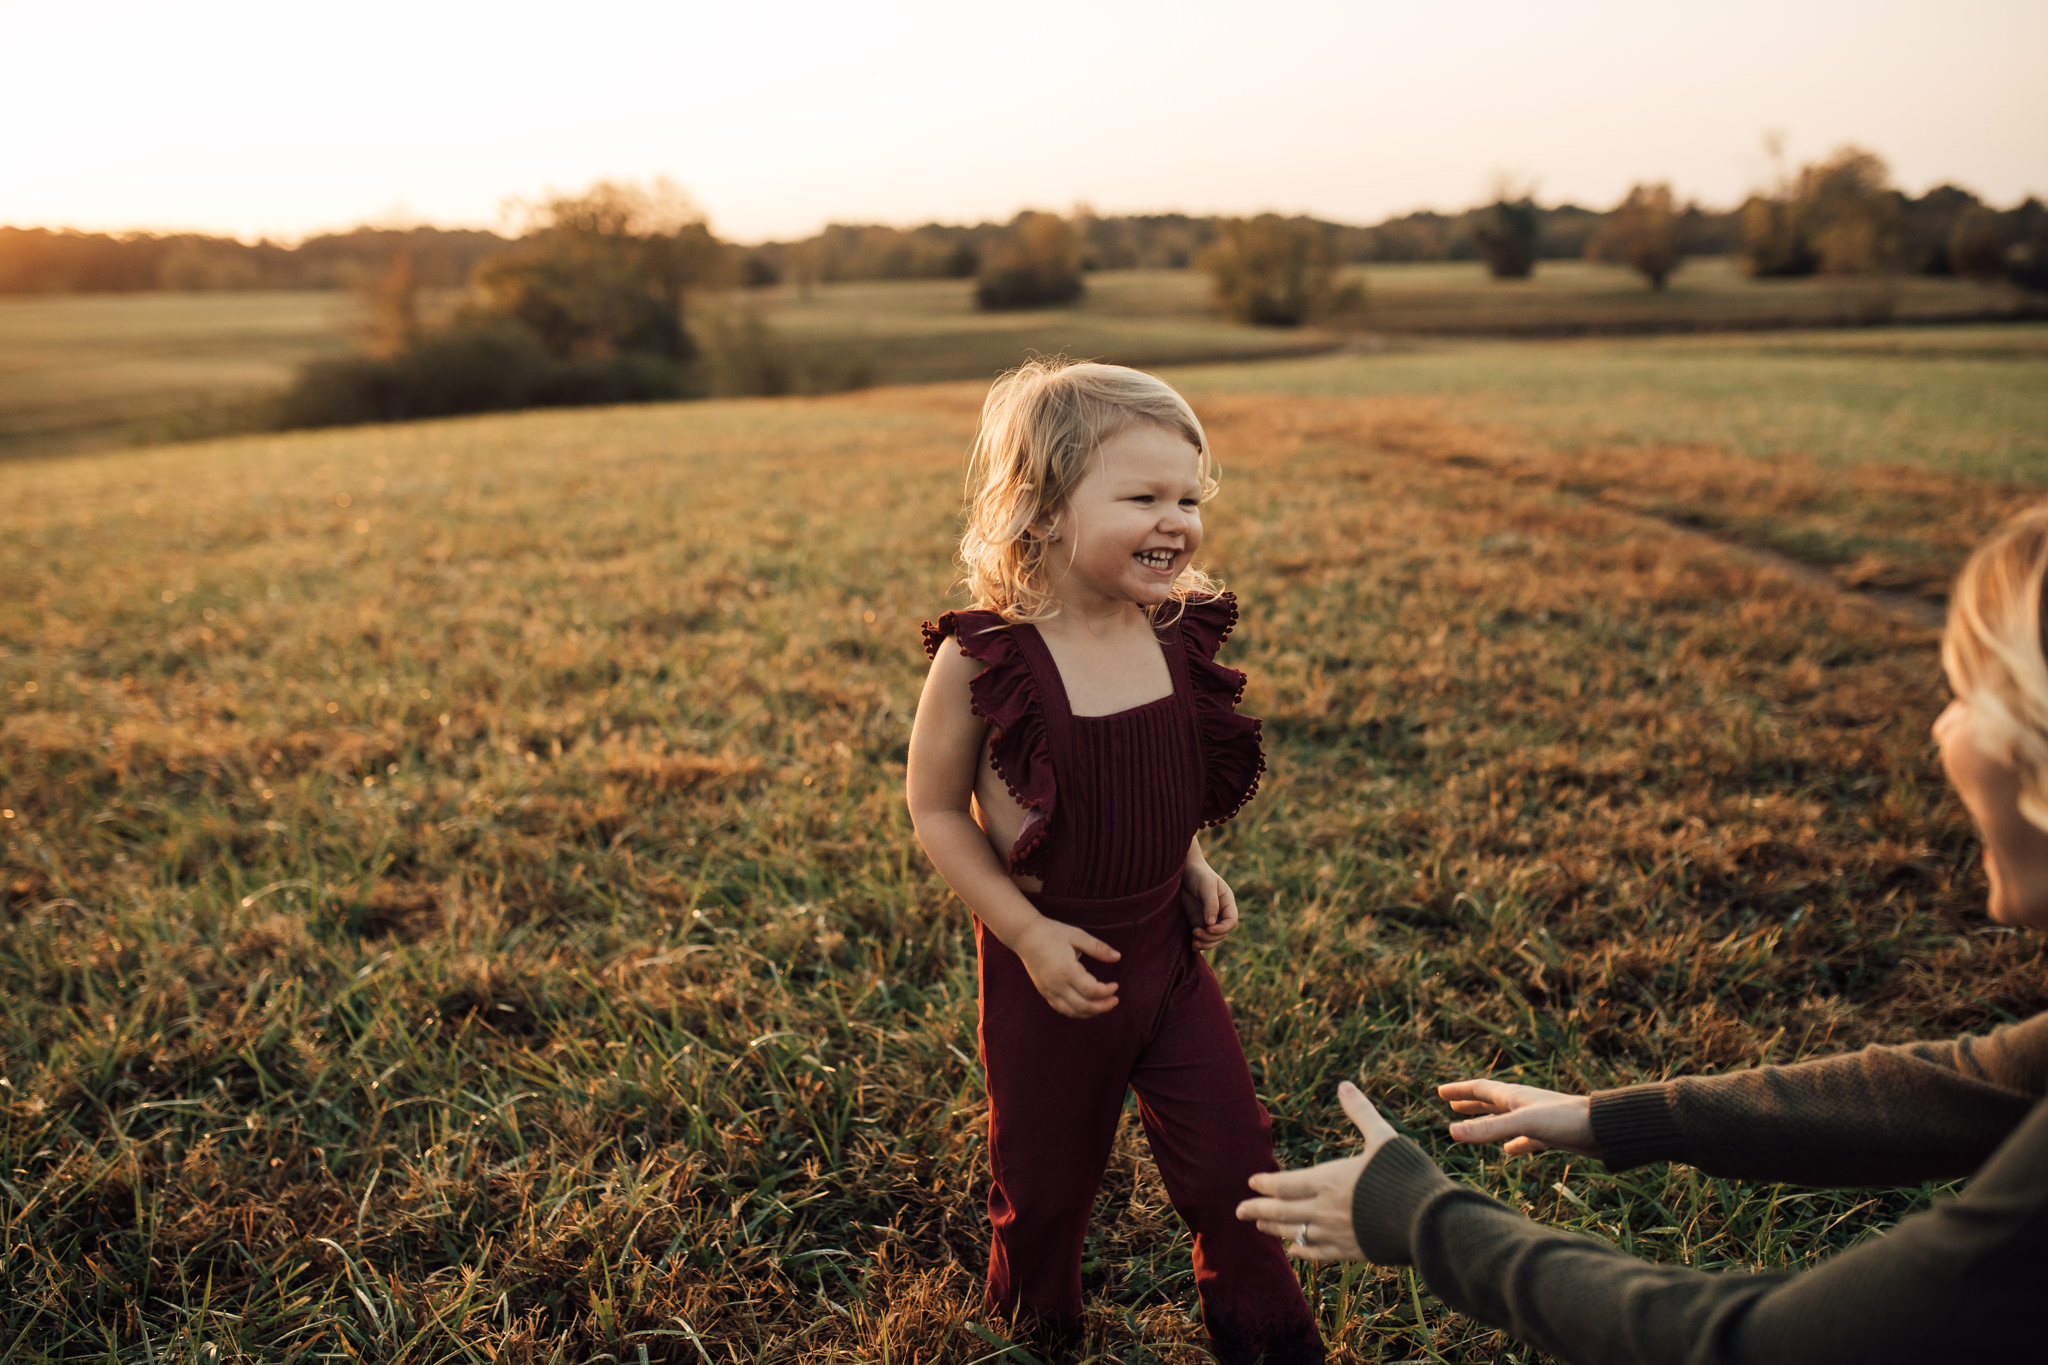 cassie-cook-photography-memphis-family-photographer-lifestyle-family-photographer-sunrise-gray-family-18.jpg